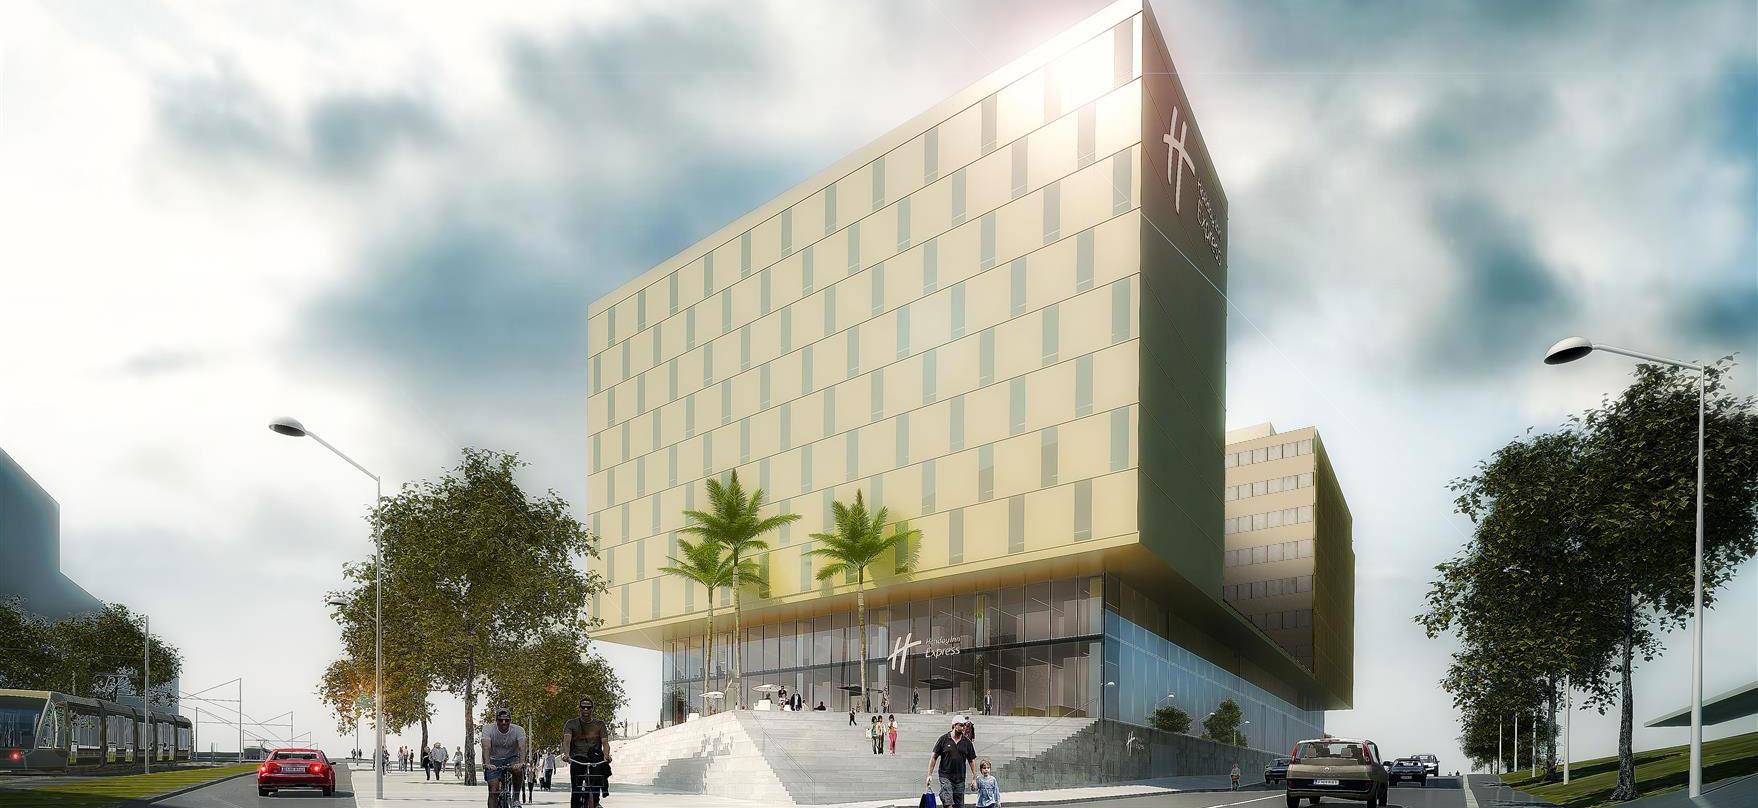 HPVA-Hotels-Projet-Nice-Grand-Arénas-coté-parvis-avenue-galerie